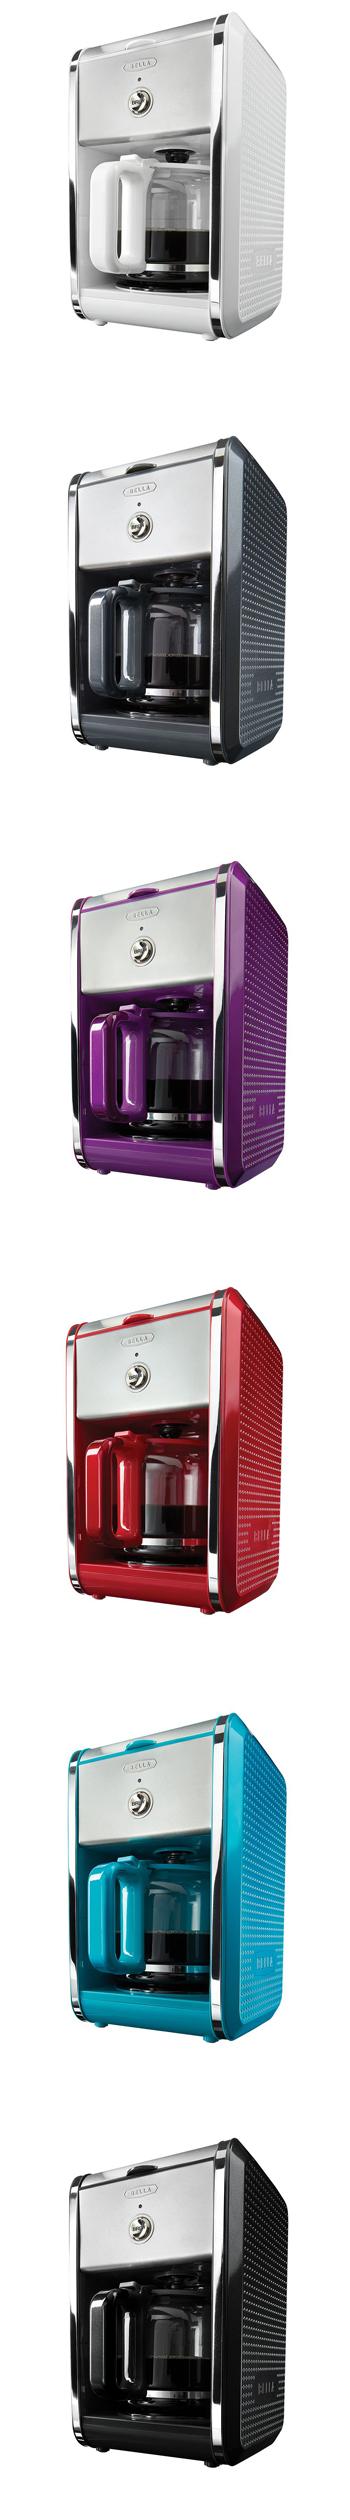 Coffee never looked so good. #Kohls Tools & Home Improvement - Coffee, Tea & Espresso Appliances - http://amzn.to/2lyIEN6